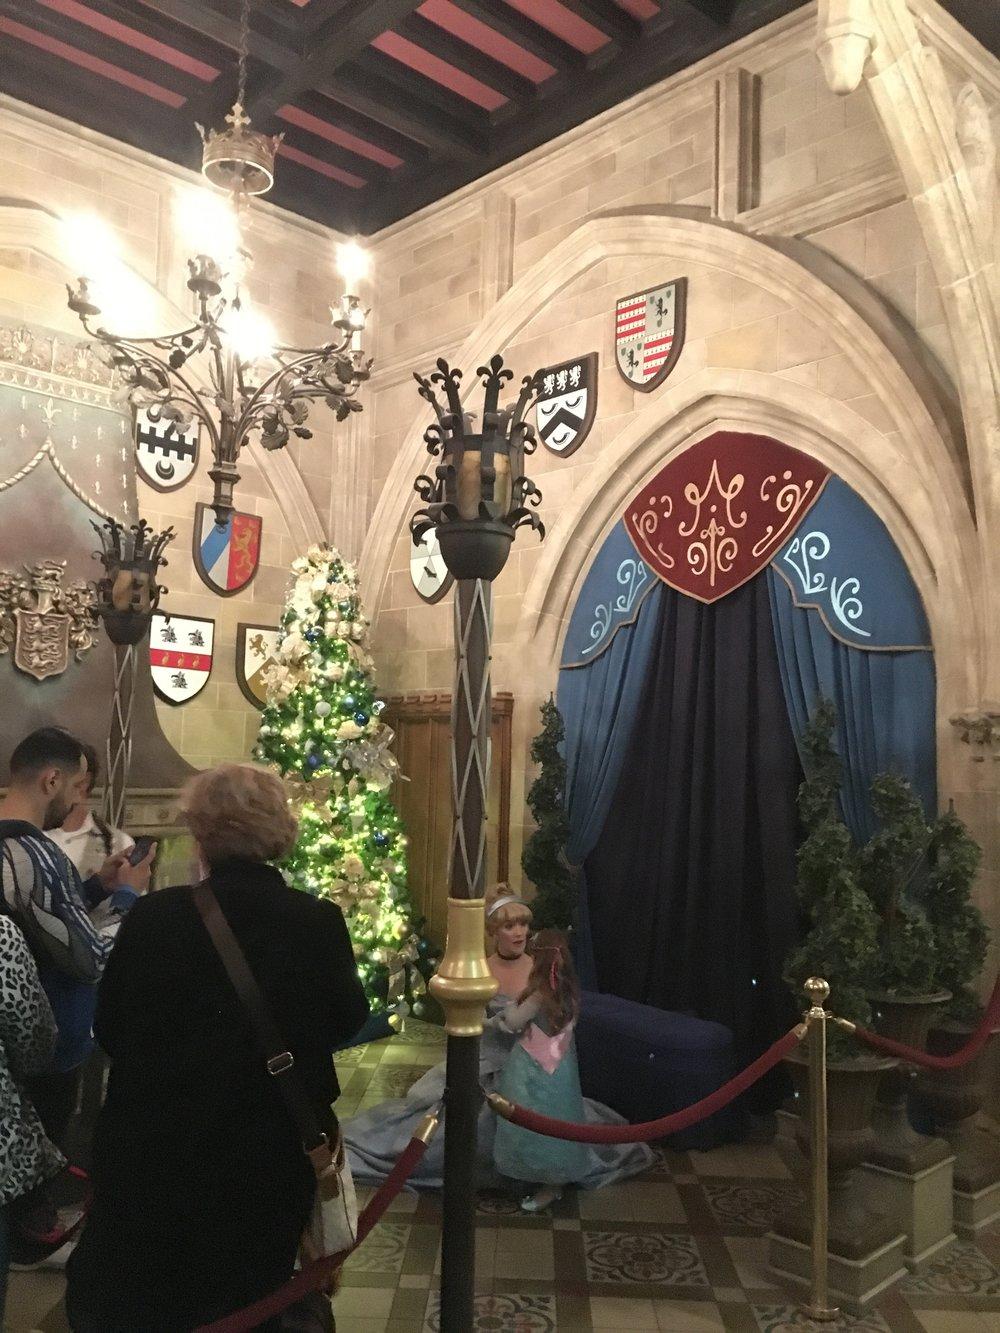 Cinderella greeting guests